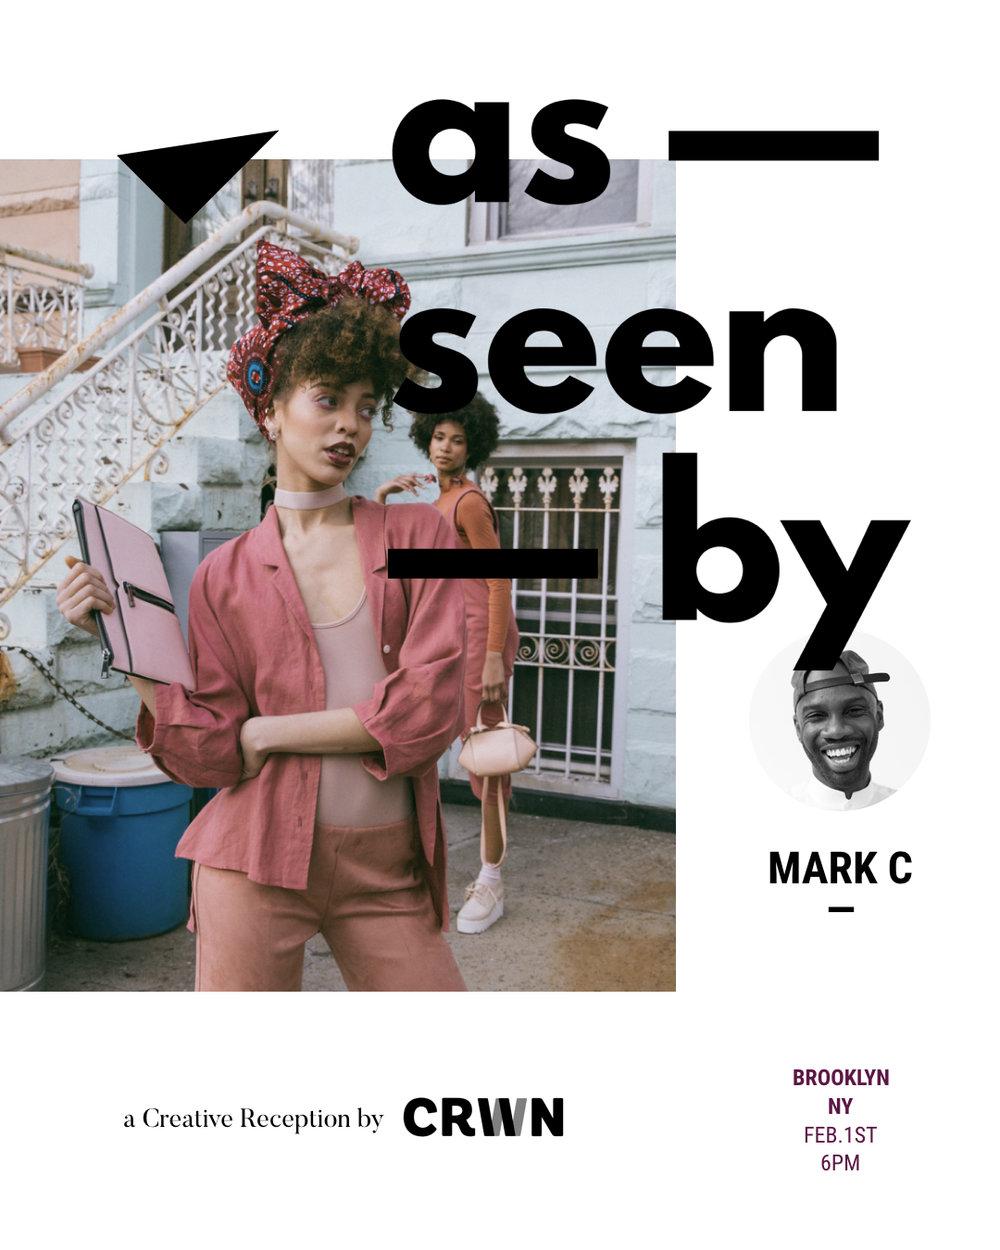 crwnmag-creative-reception.markc.jpeg